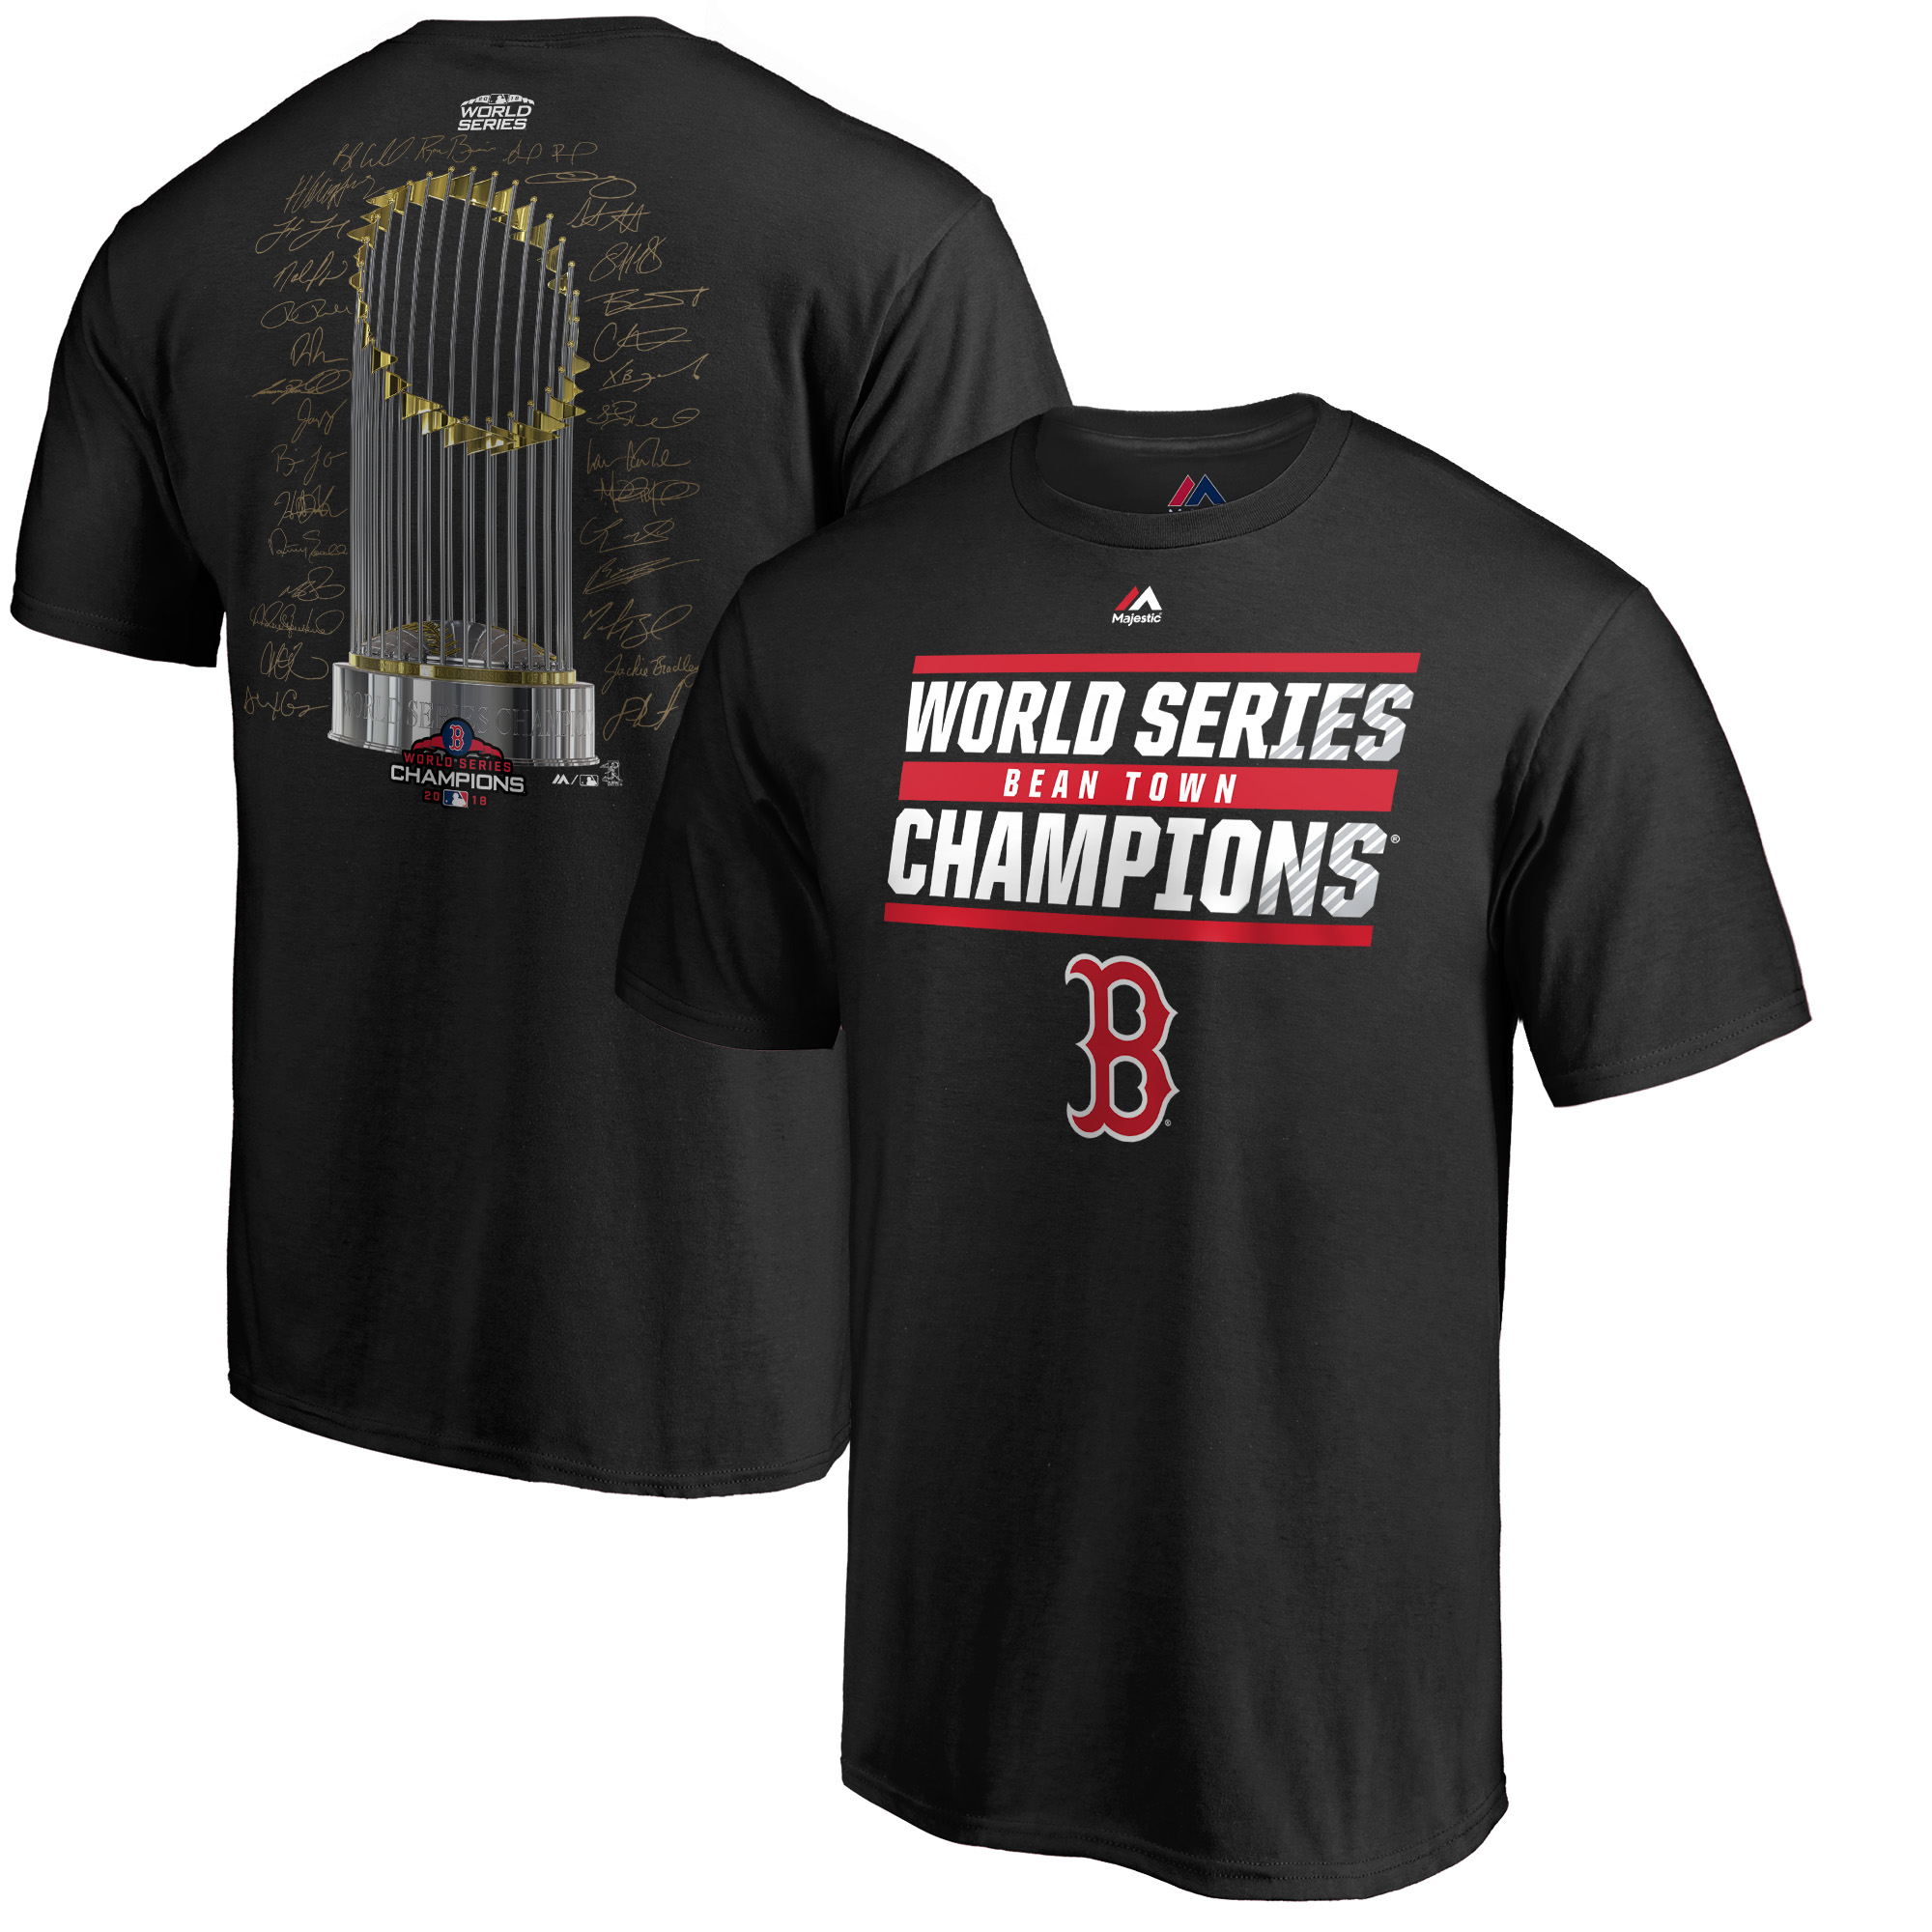 Boston Red Sox Majestic 2018 World Series Champions Signature Roster T-Shirt - Black